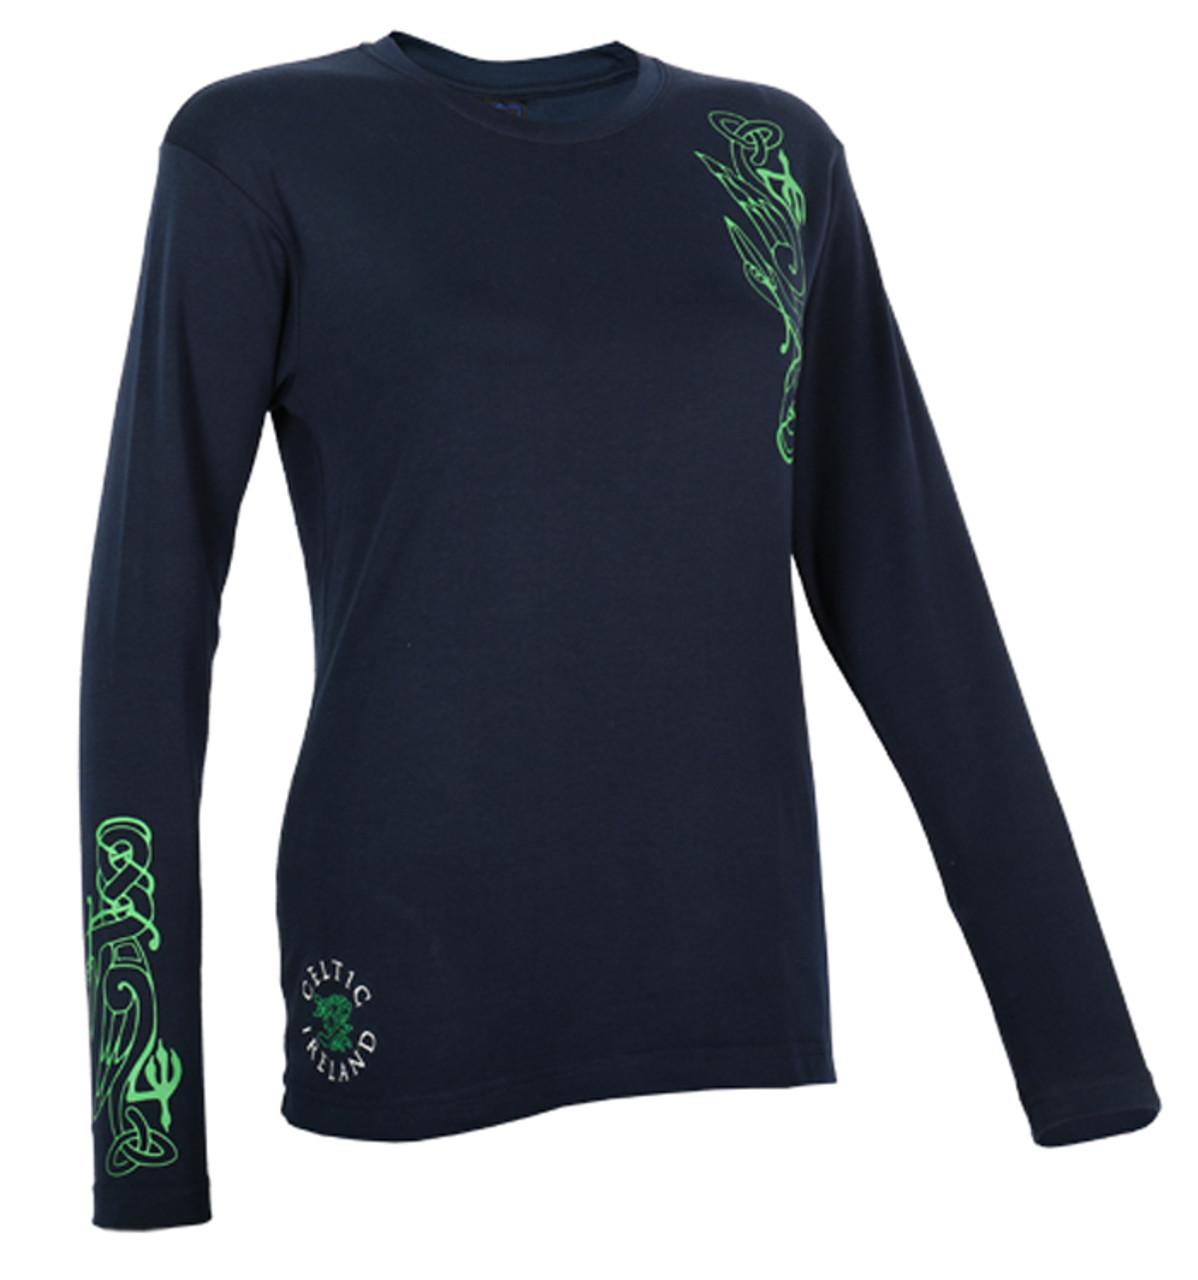 Navy Ireland Harp Crest Celts T-Shirt